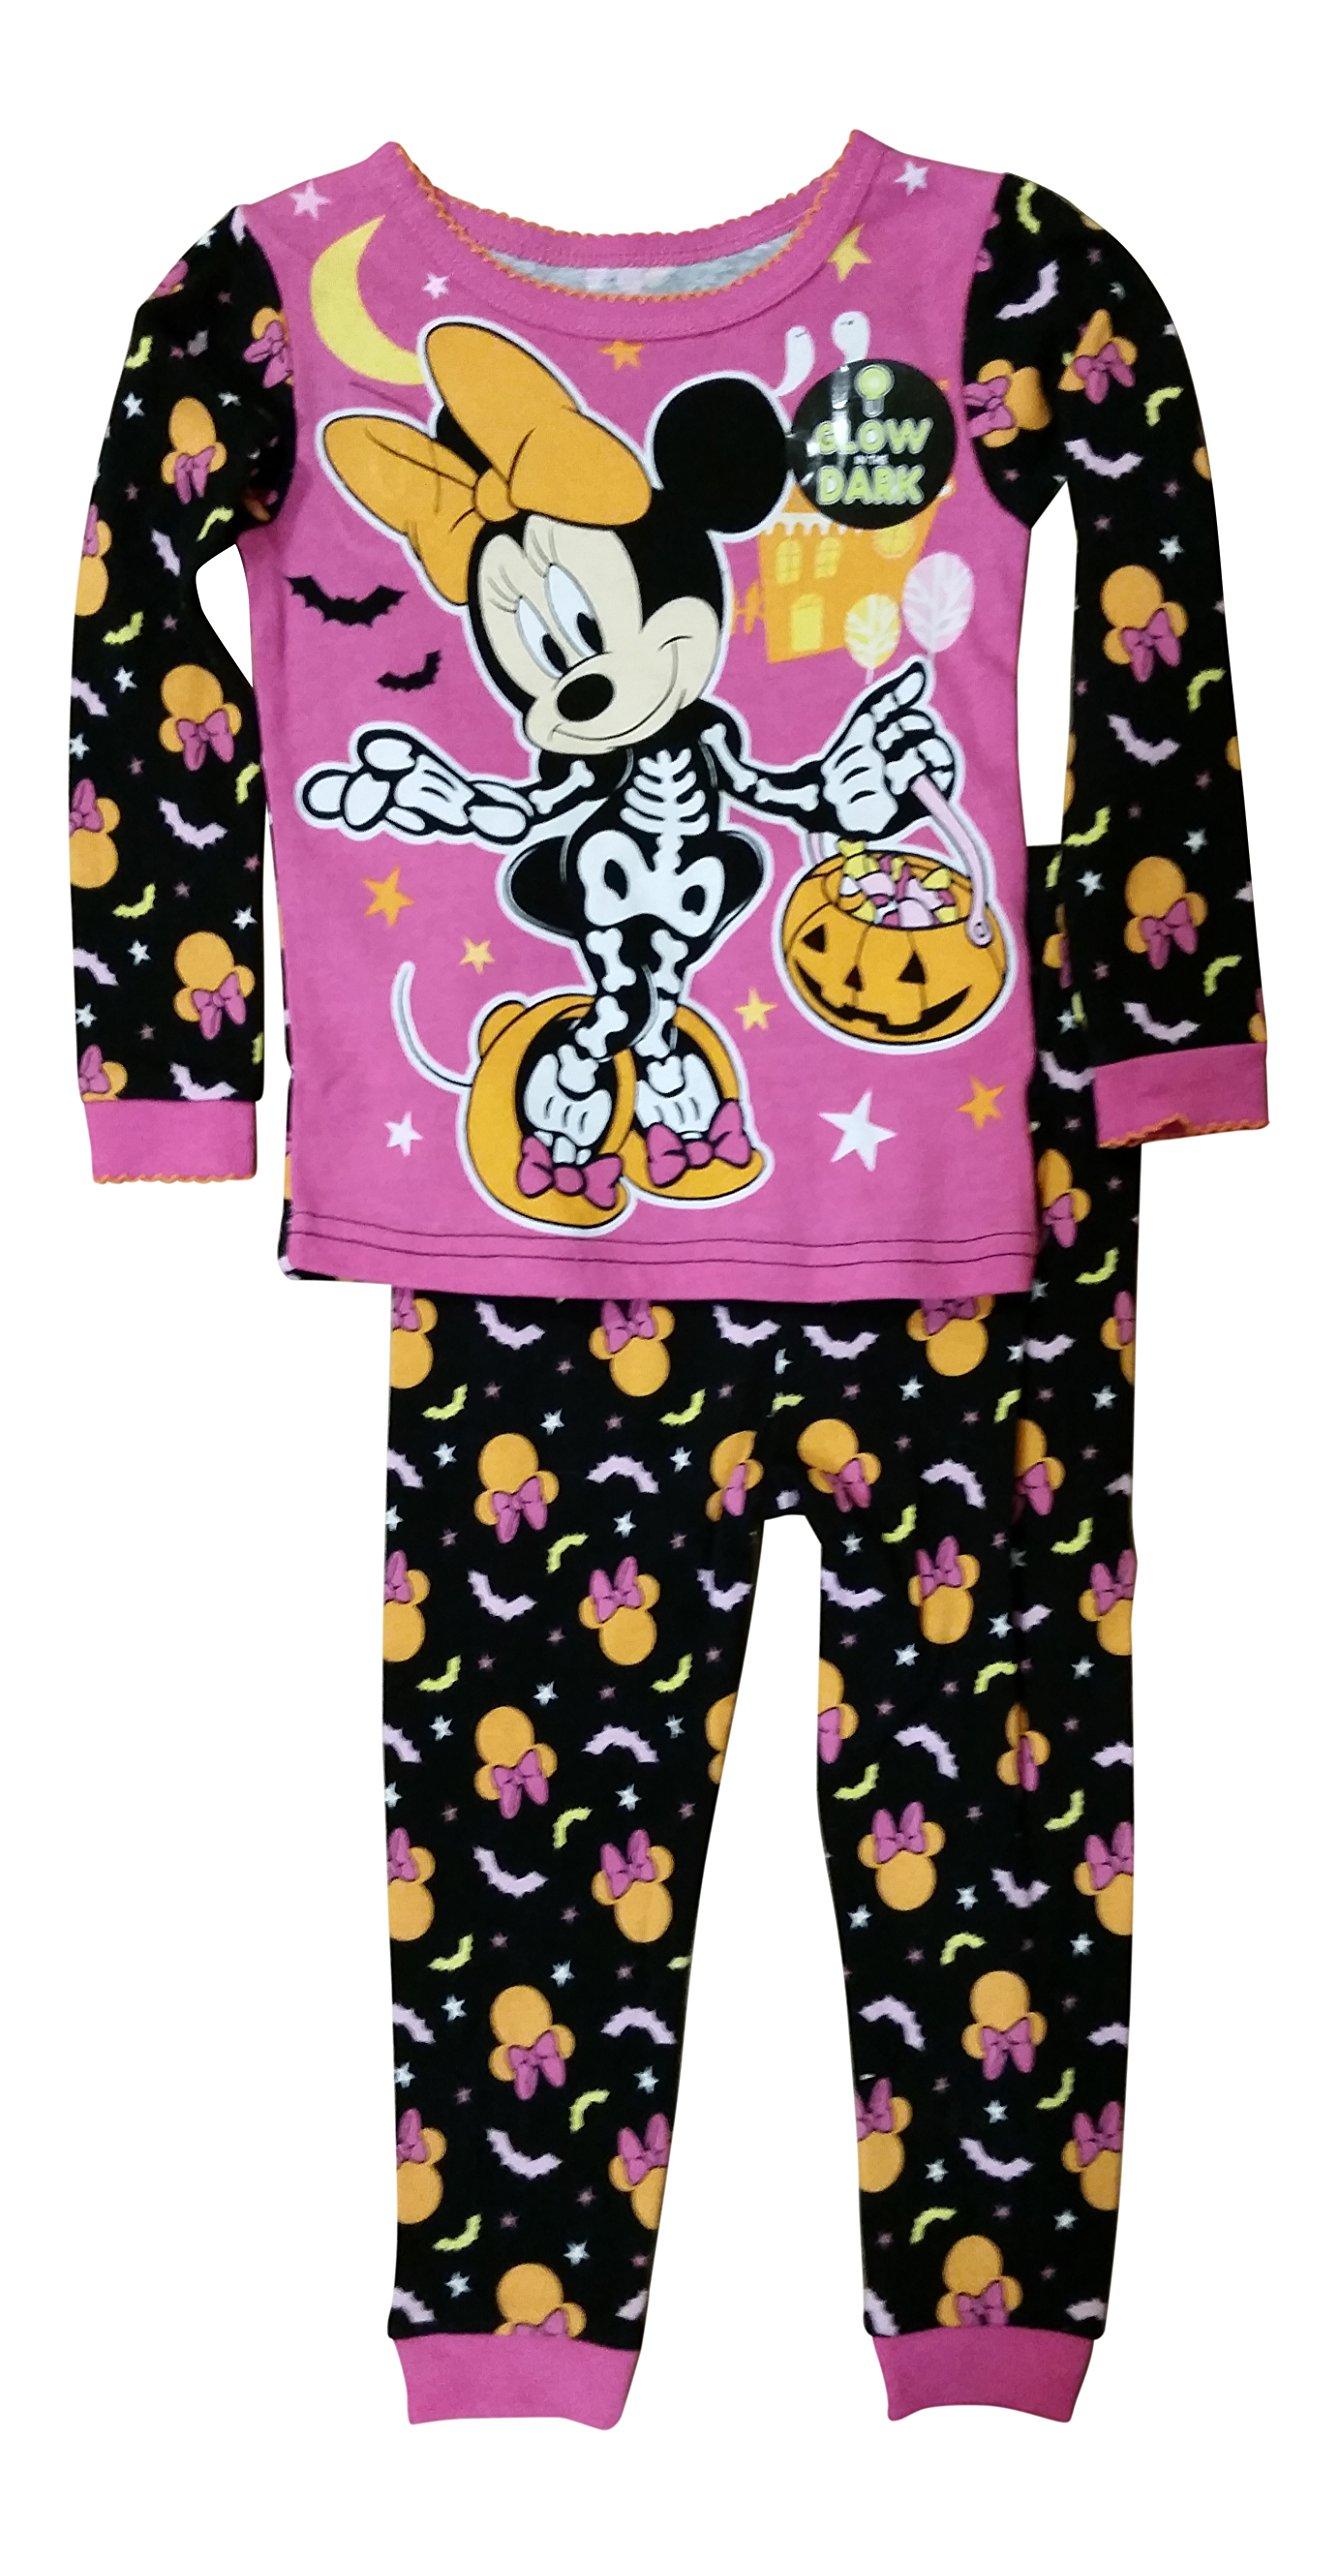 Disney Minnie Mouse Little Girls Toddler Halloween Pajama Set (5T) by Disney